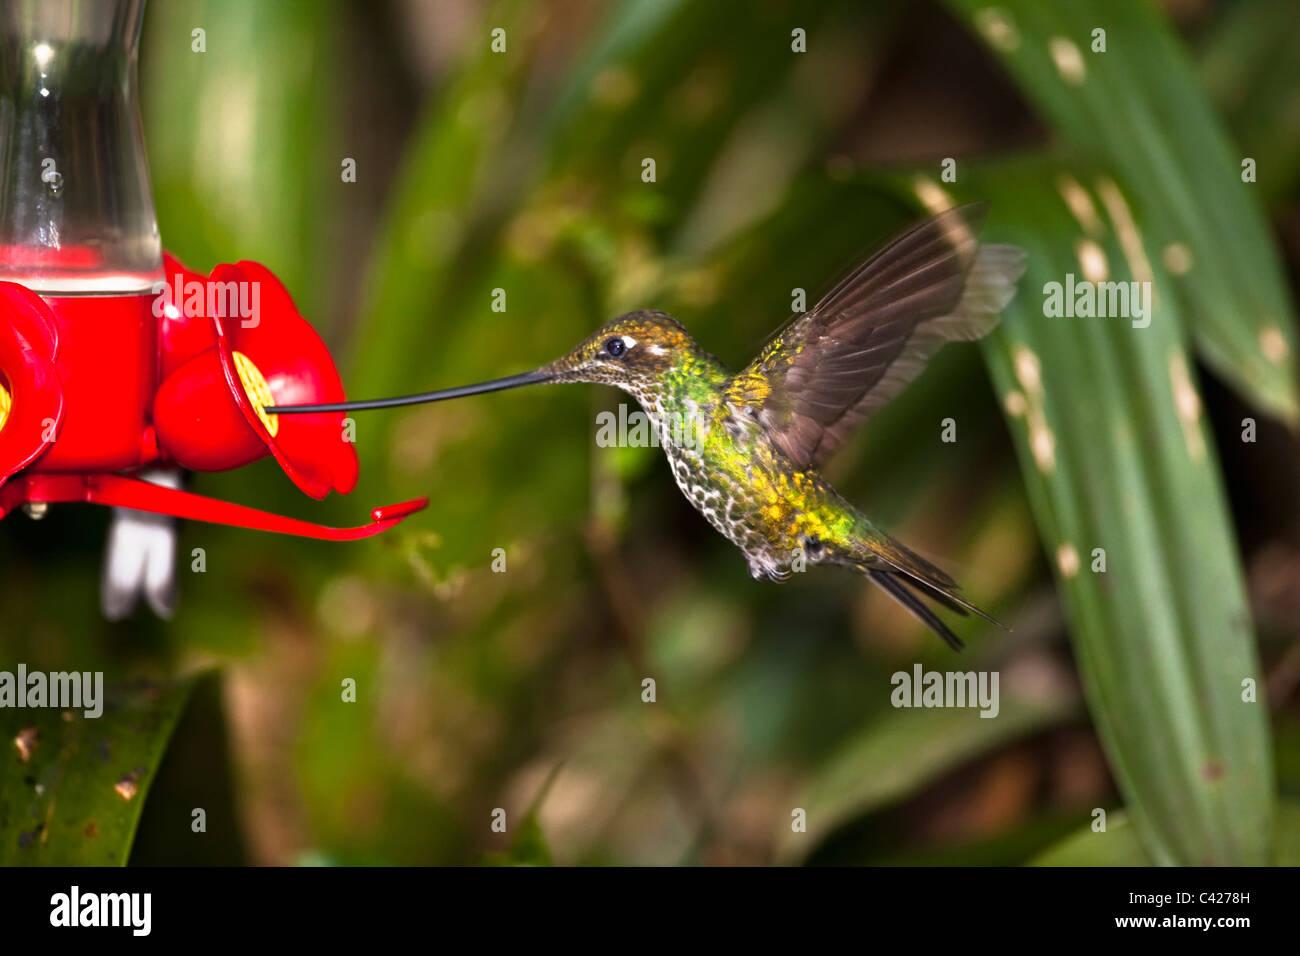 Sword-billed hummingbird ( Ensifera Ensifera ) at feeder - Stock Image